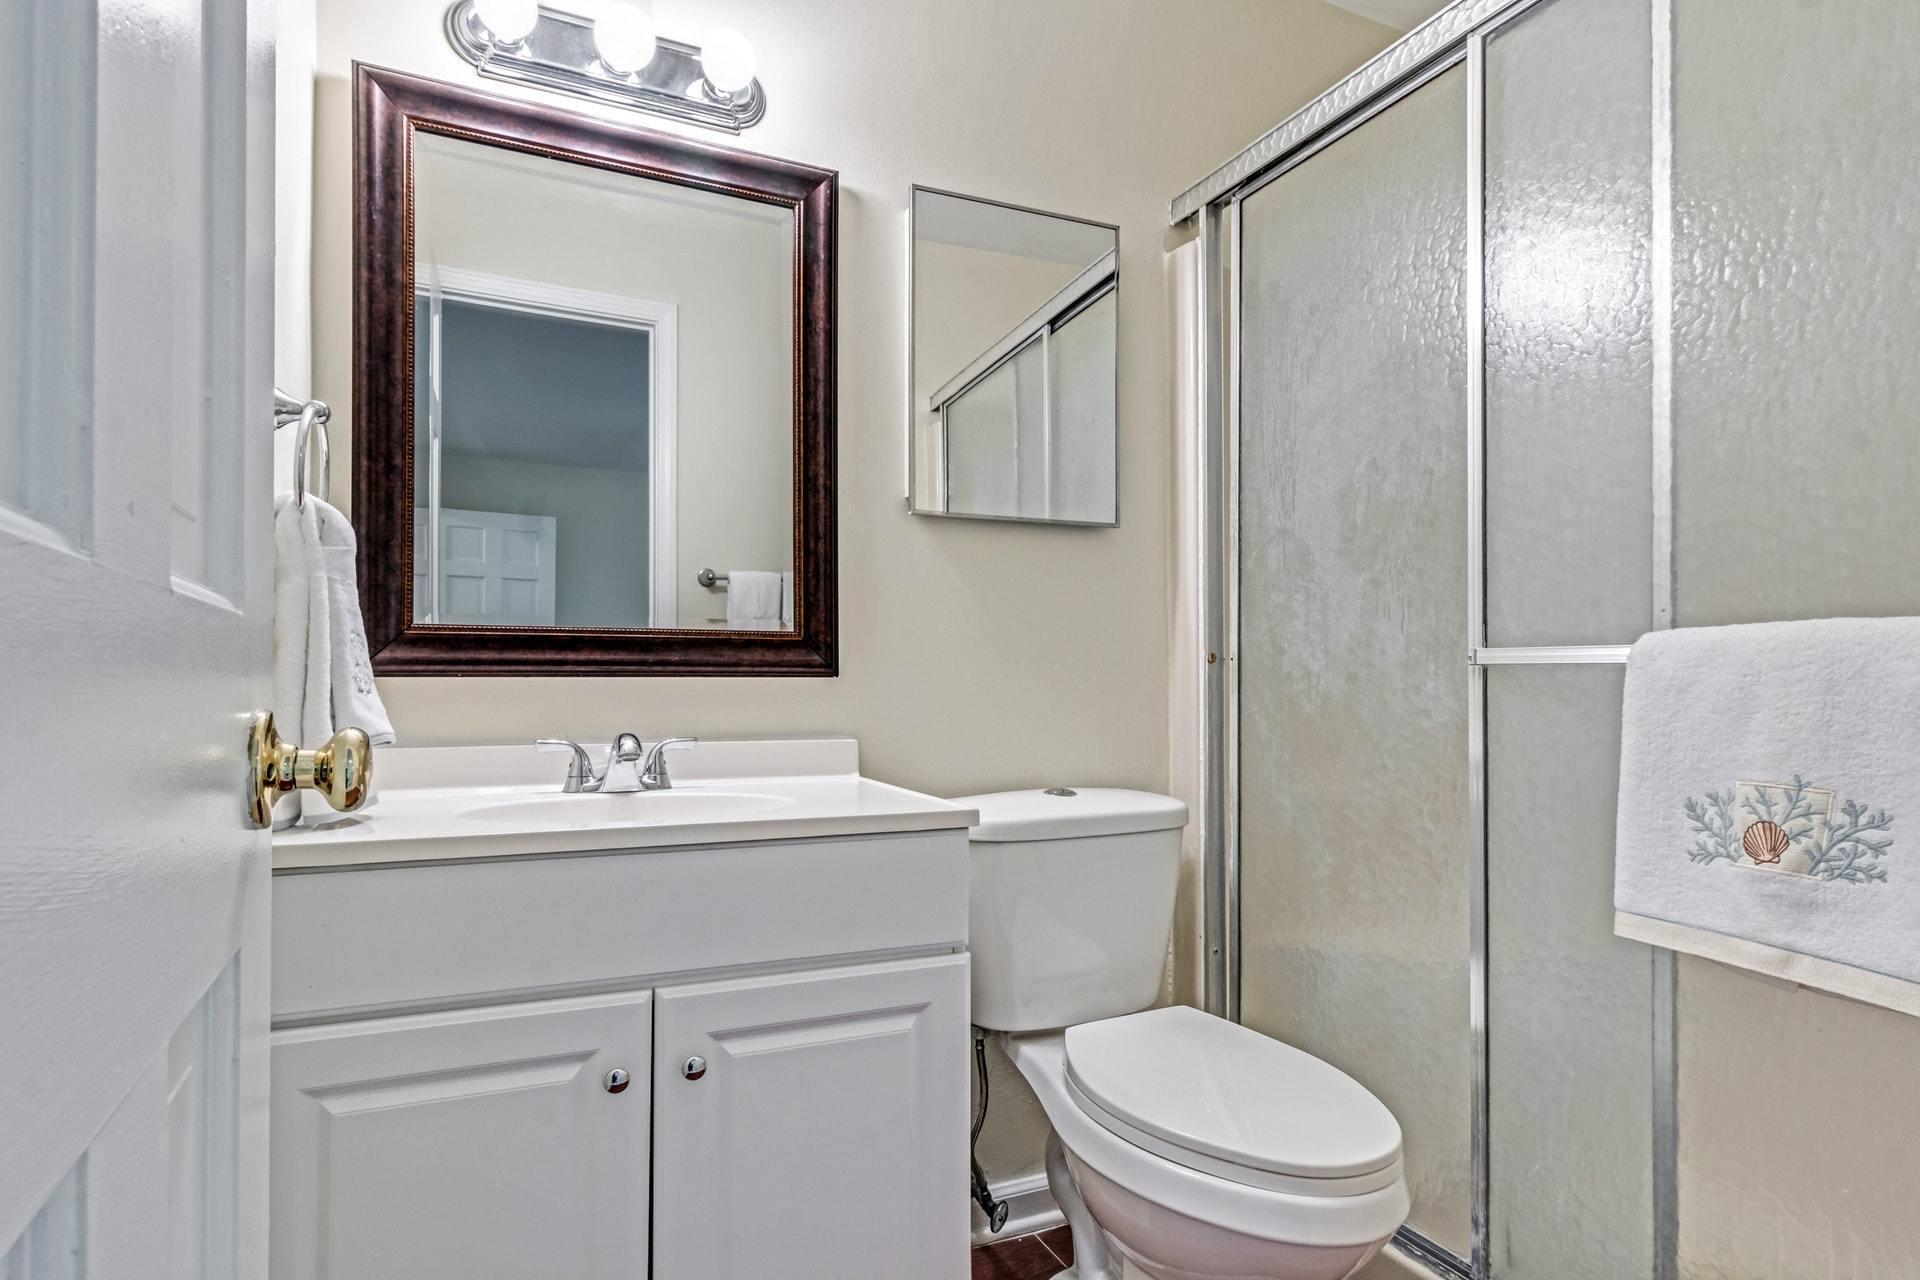 Shemwood II Homes For Sale - 969 Sea Gull, Mount Pleasant, SC - 7